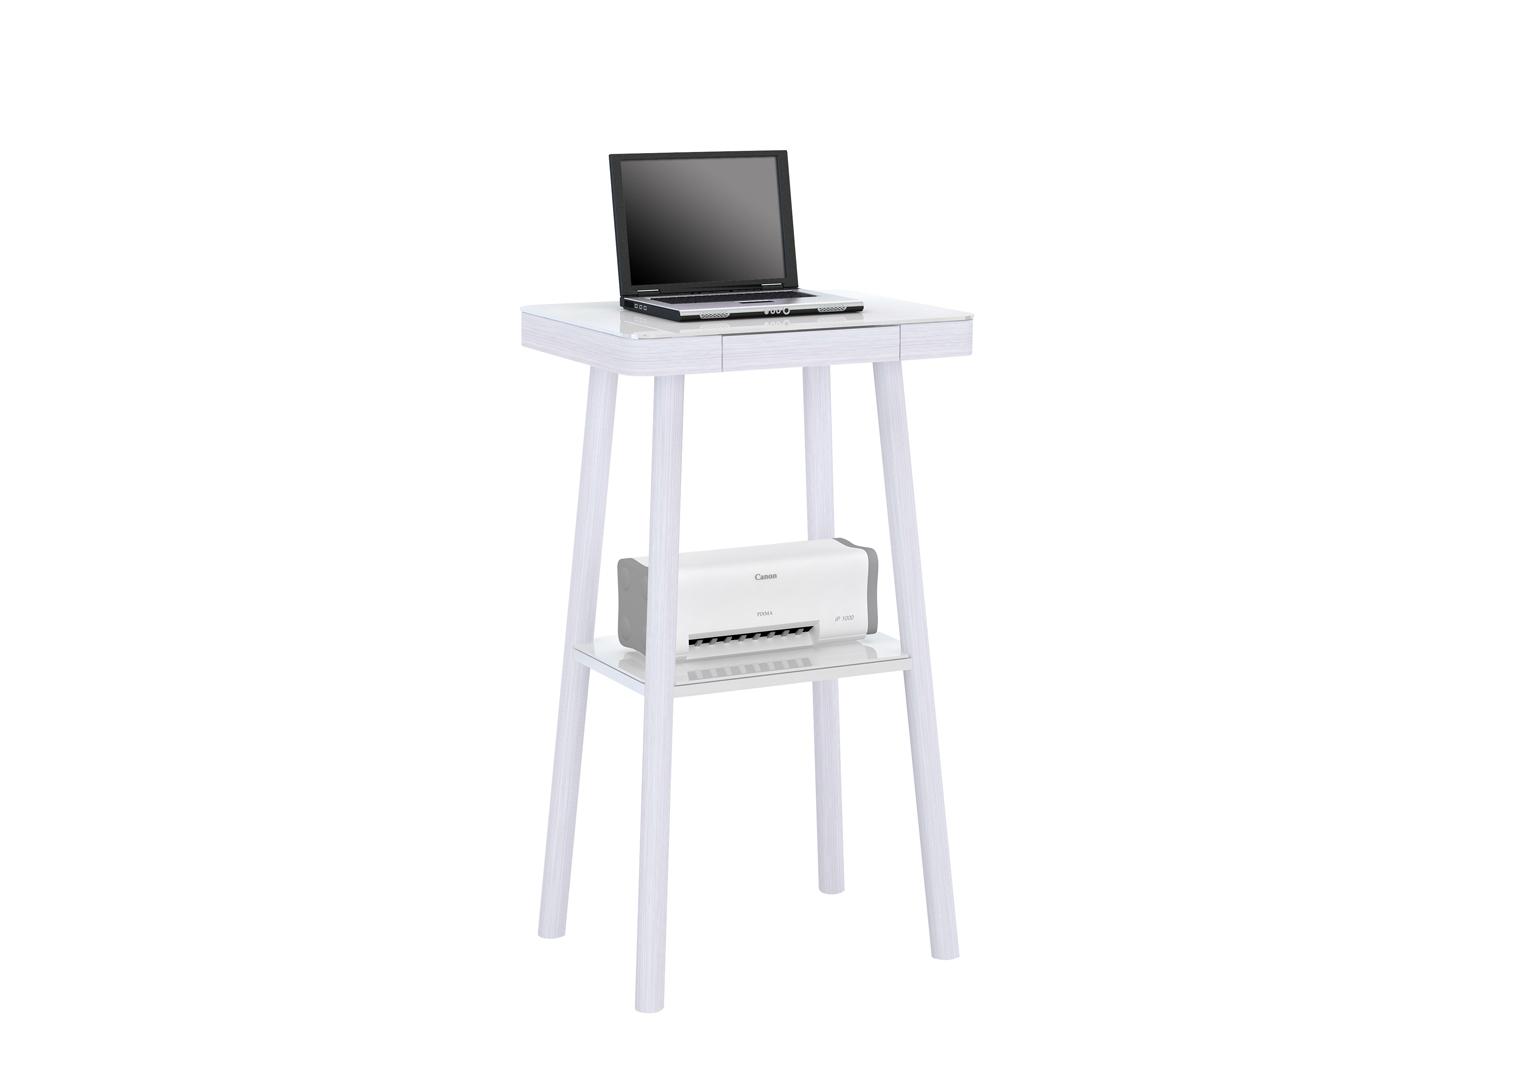 bureau pupitre design m tal alu verre blanc ryade. Black Bedroom Furniture Sets. Home Design Ideas